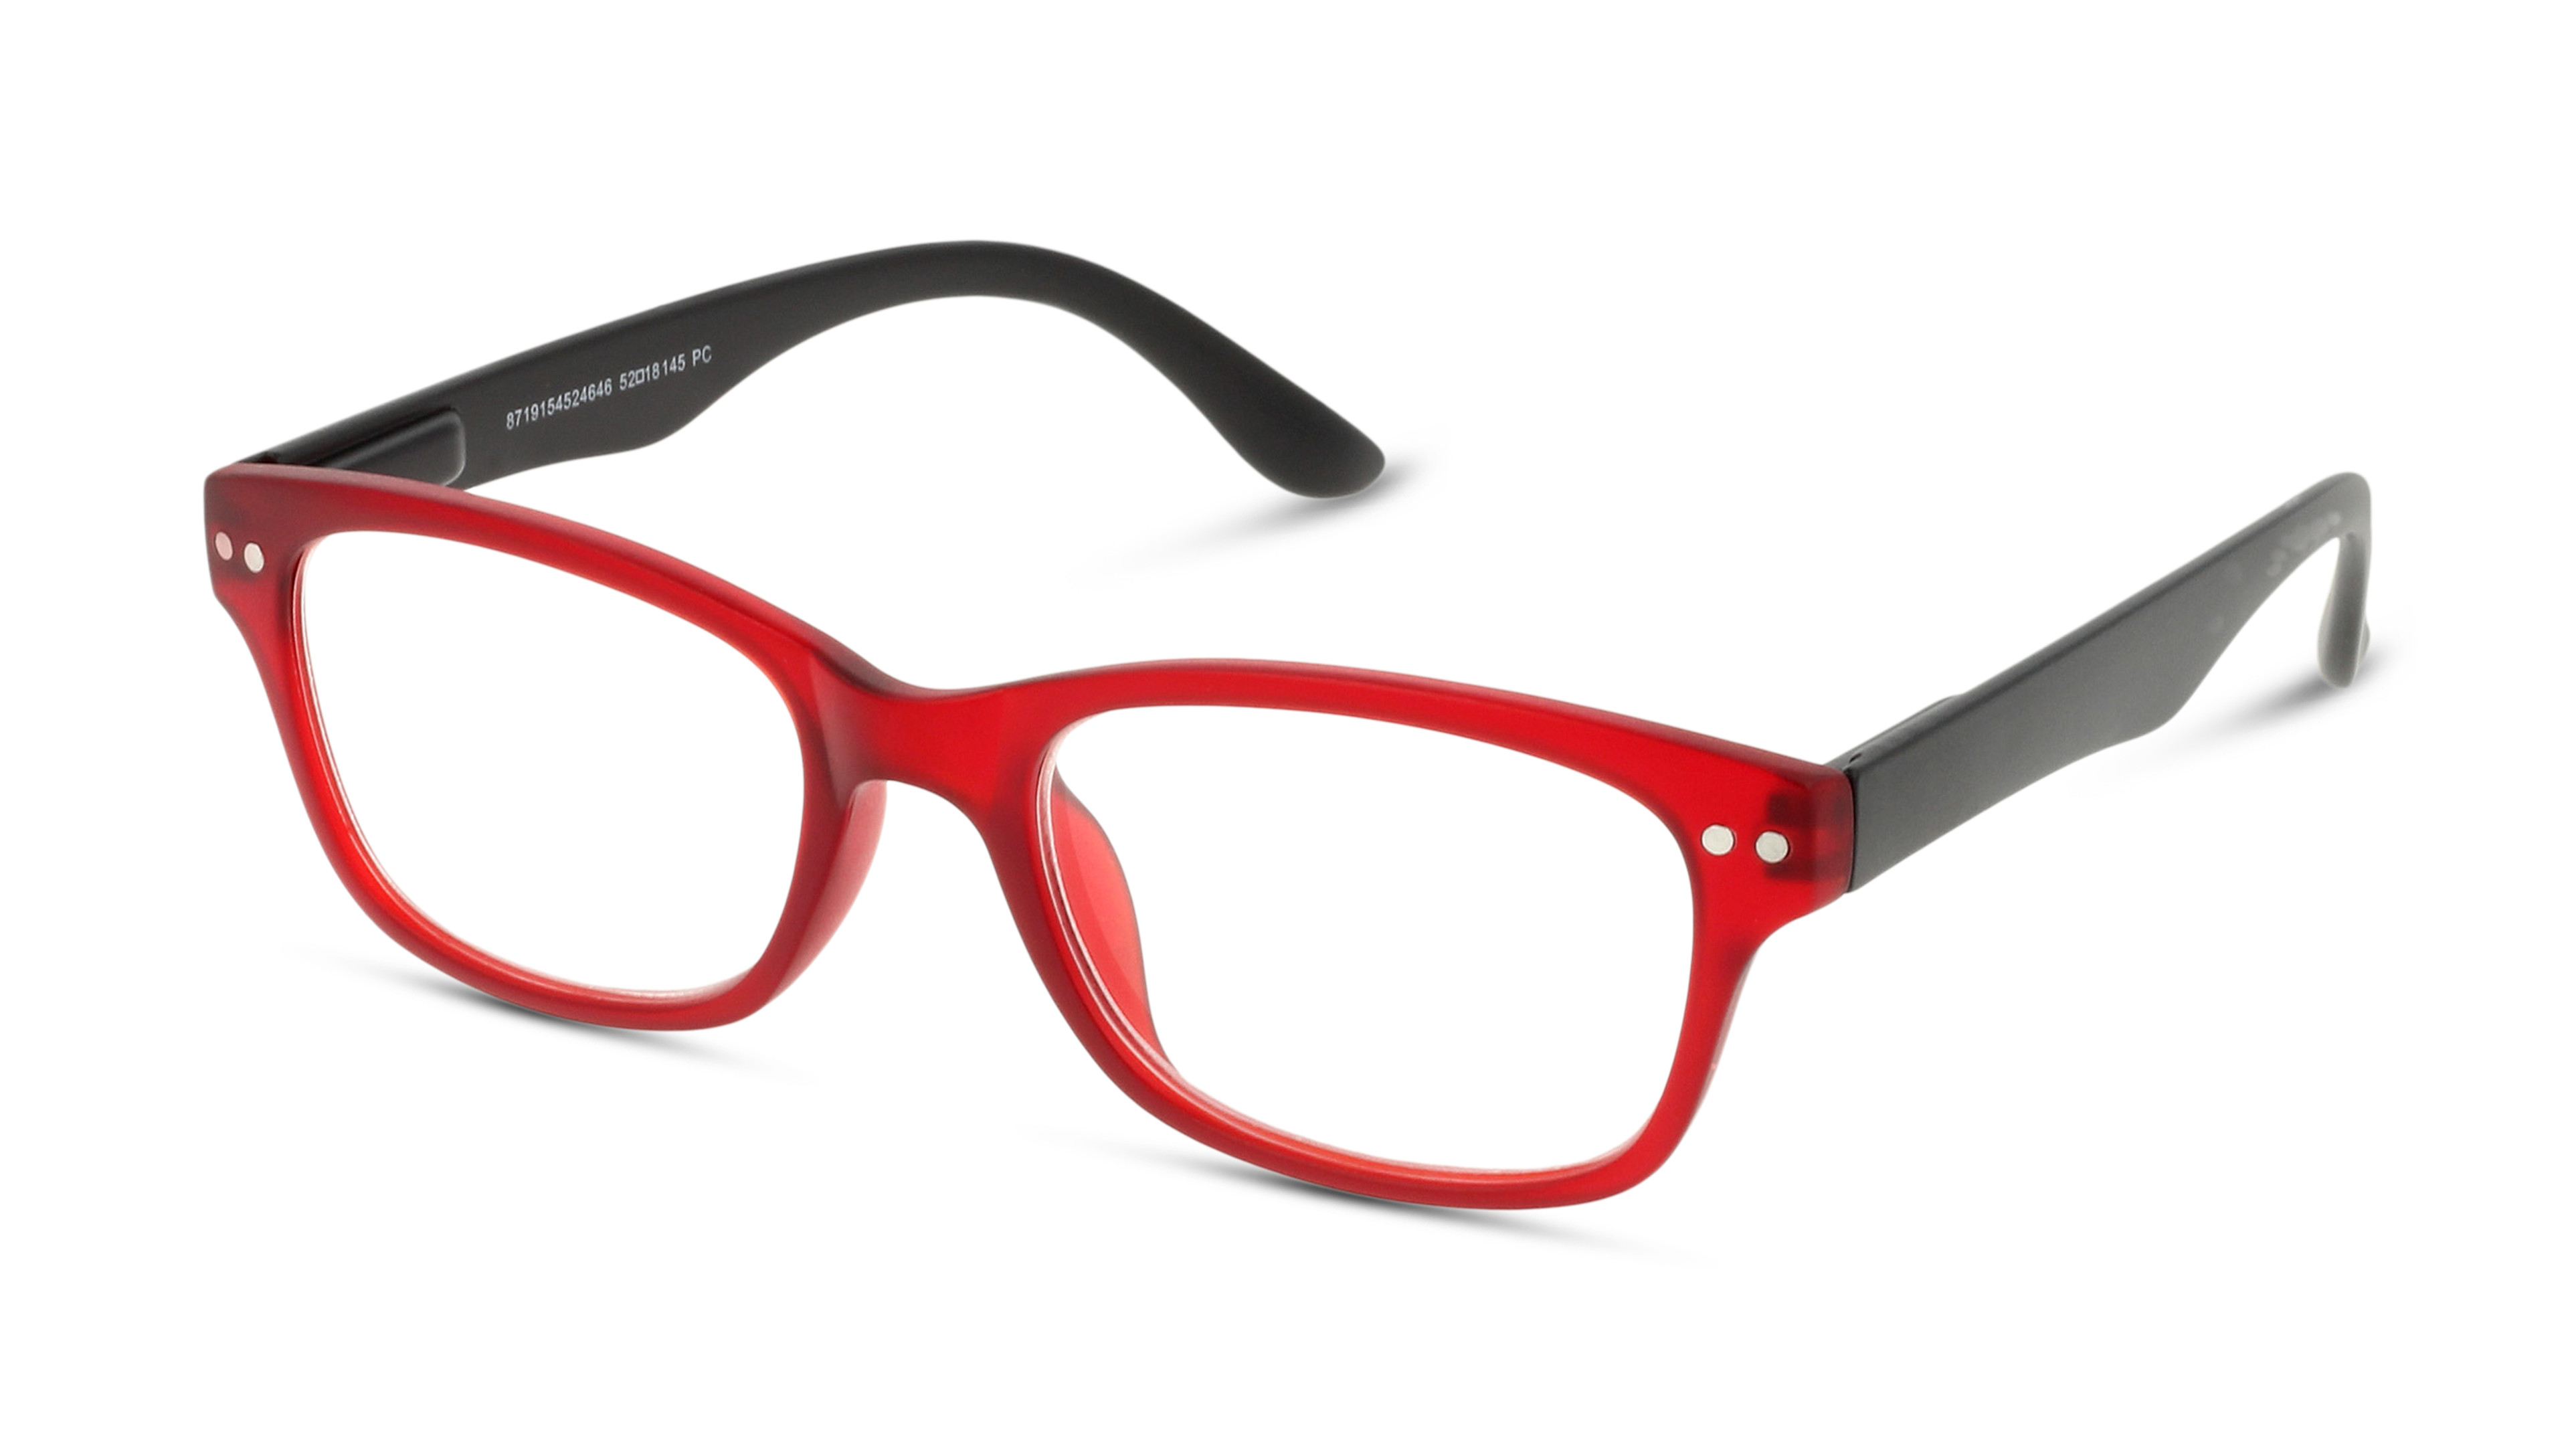 8719154524646-angle-03-gv-library-hfcu08-Eyewear-red-black